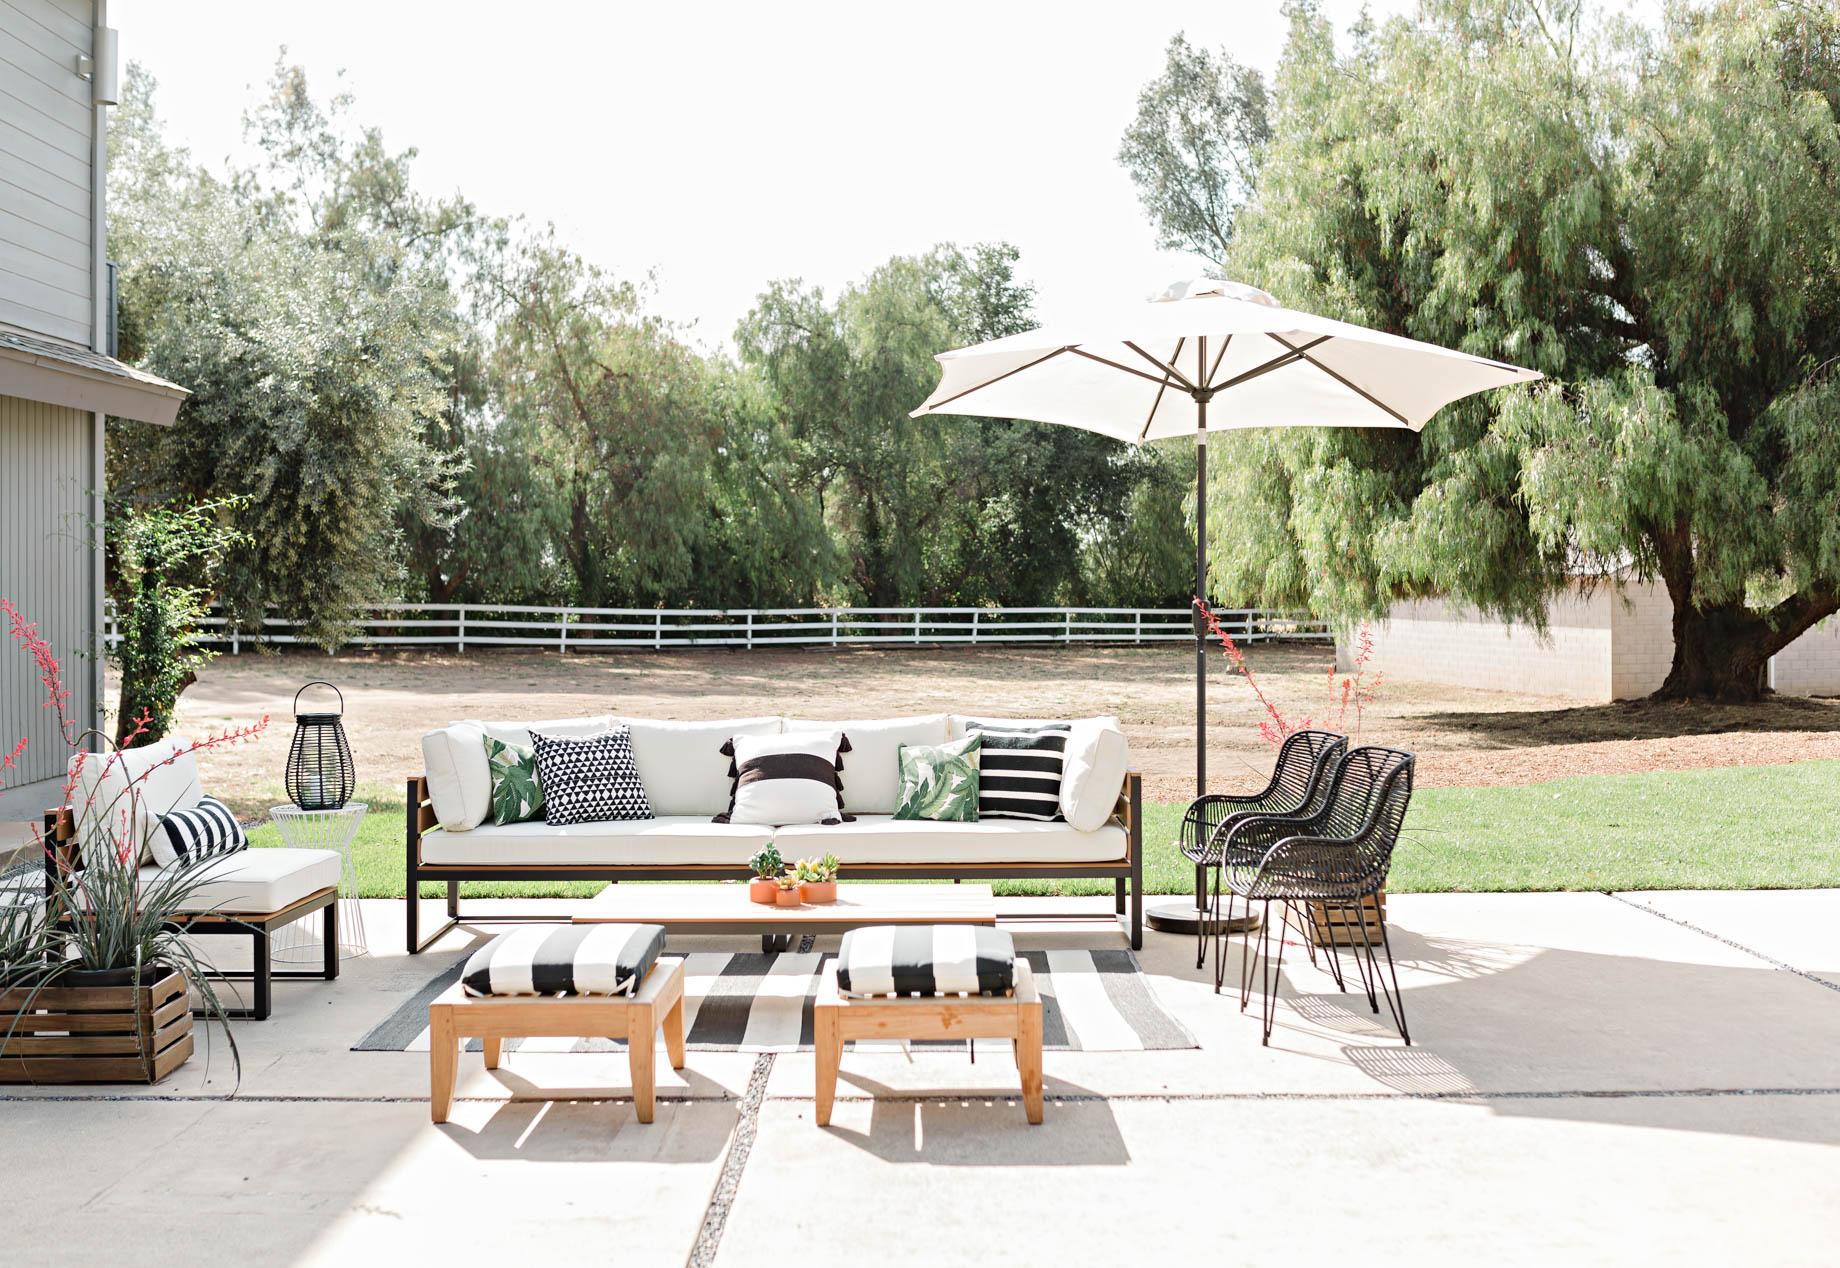 San Diego Modern Contemporary - Valley Center, CA, USA